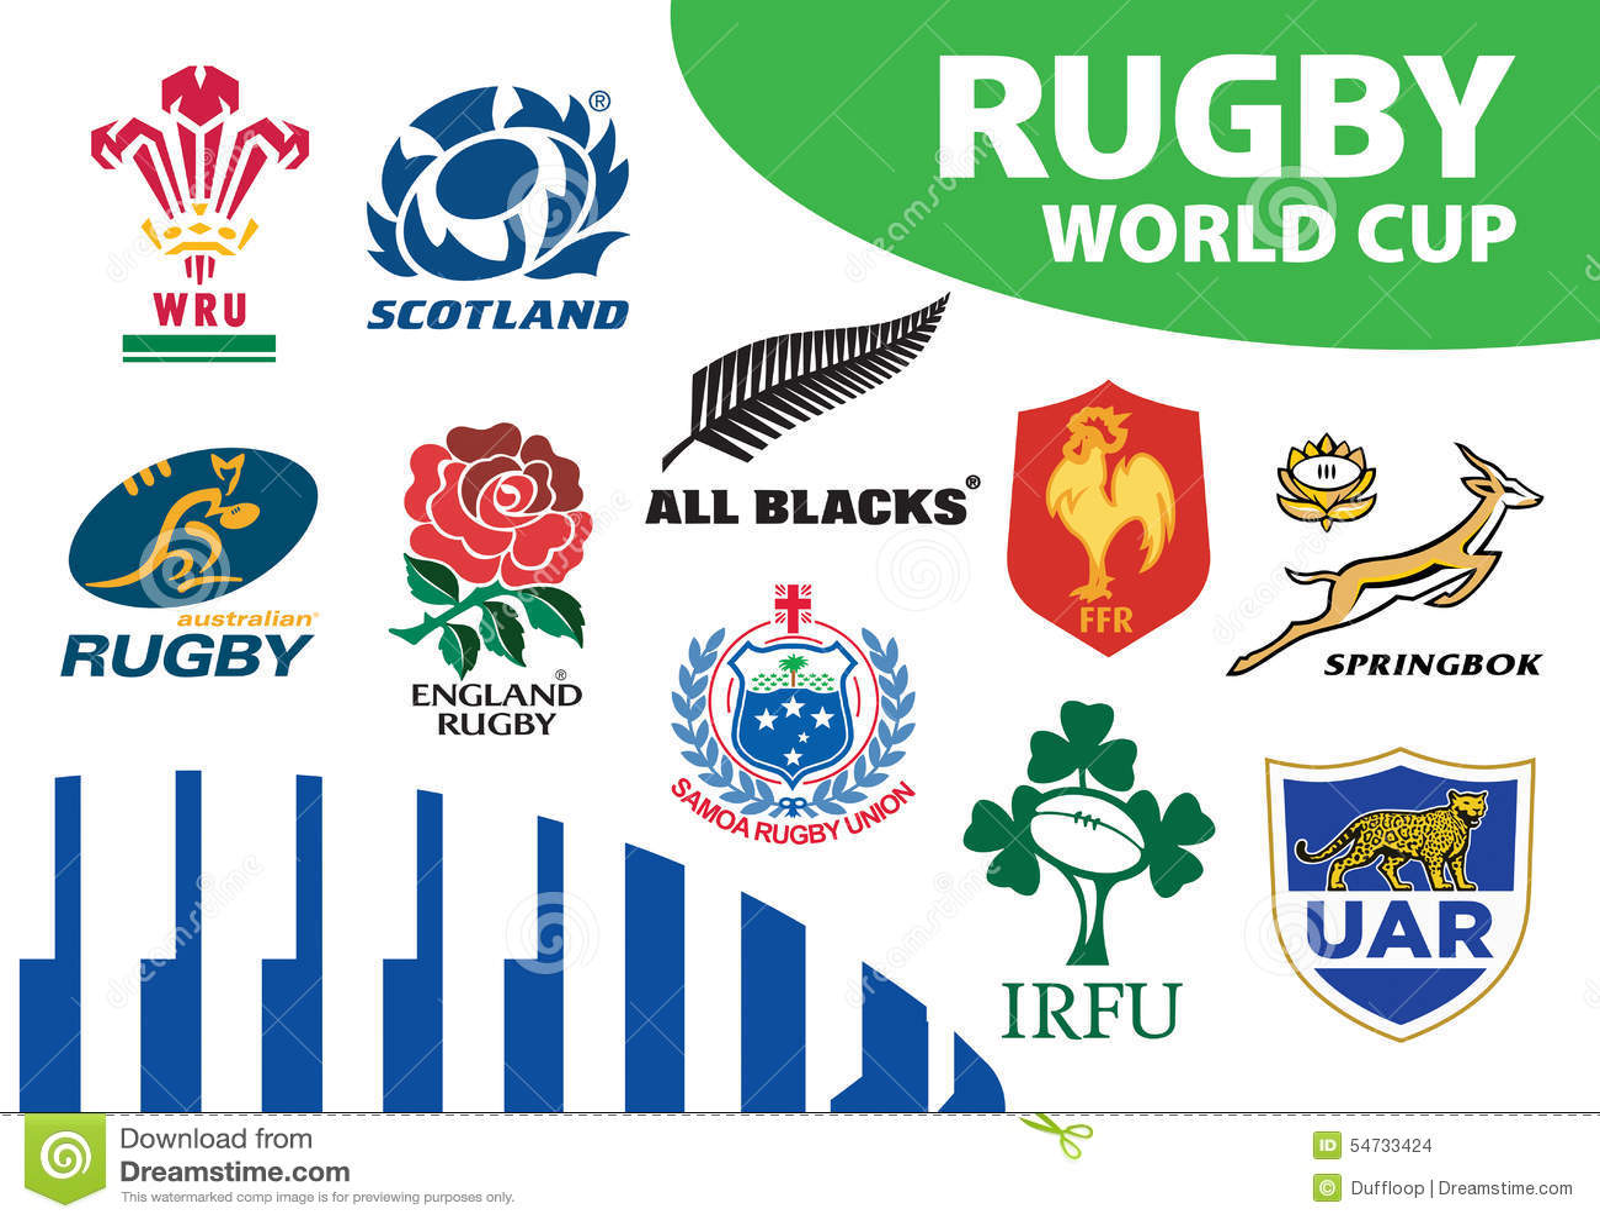 Rugby-Verbands-Weltcup Team Logos